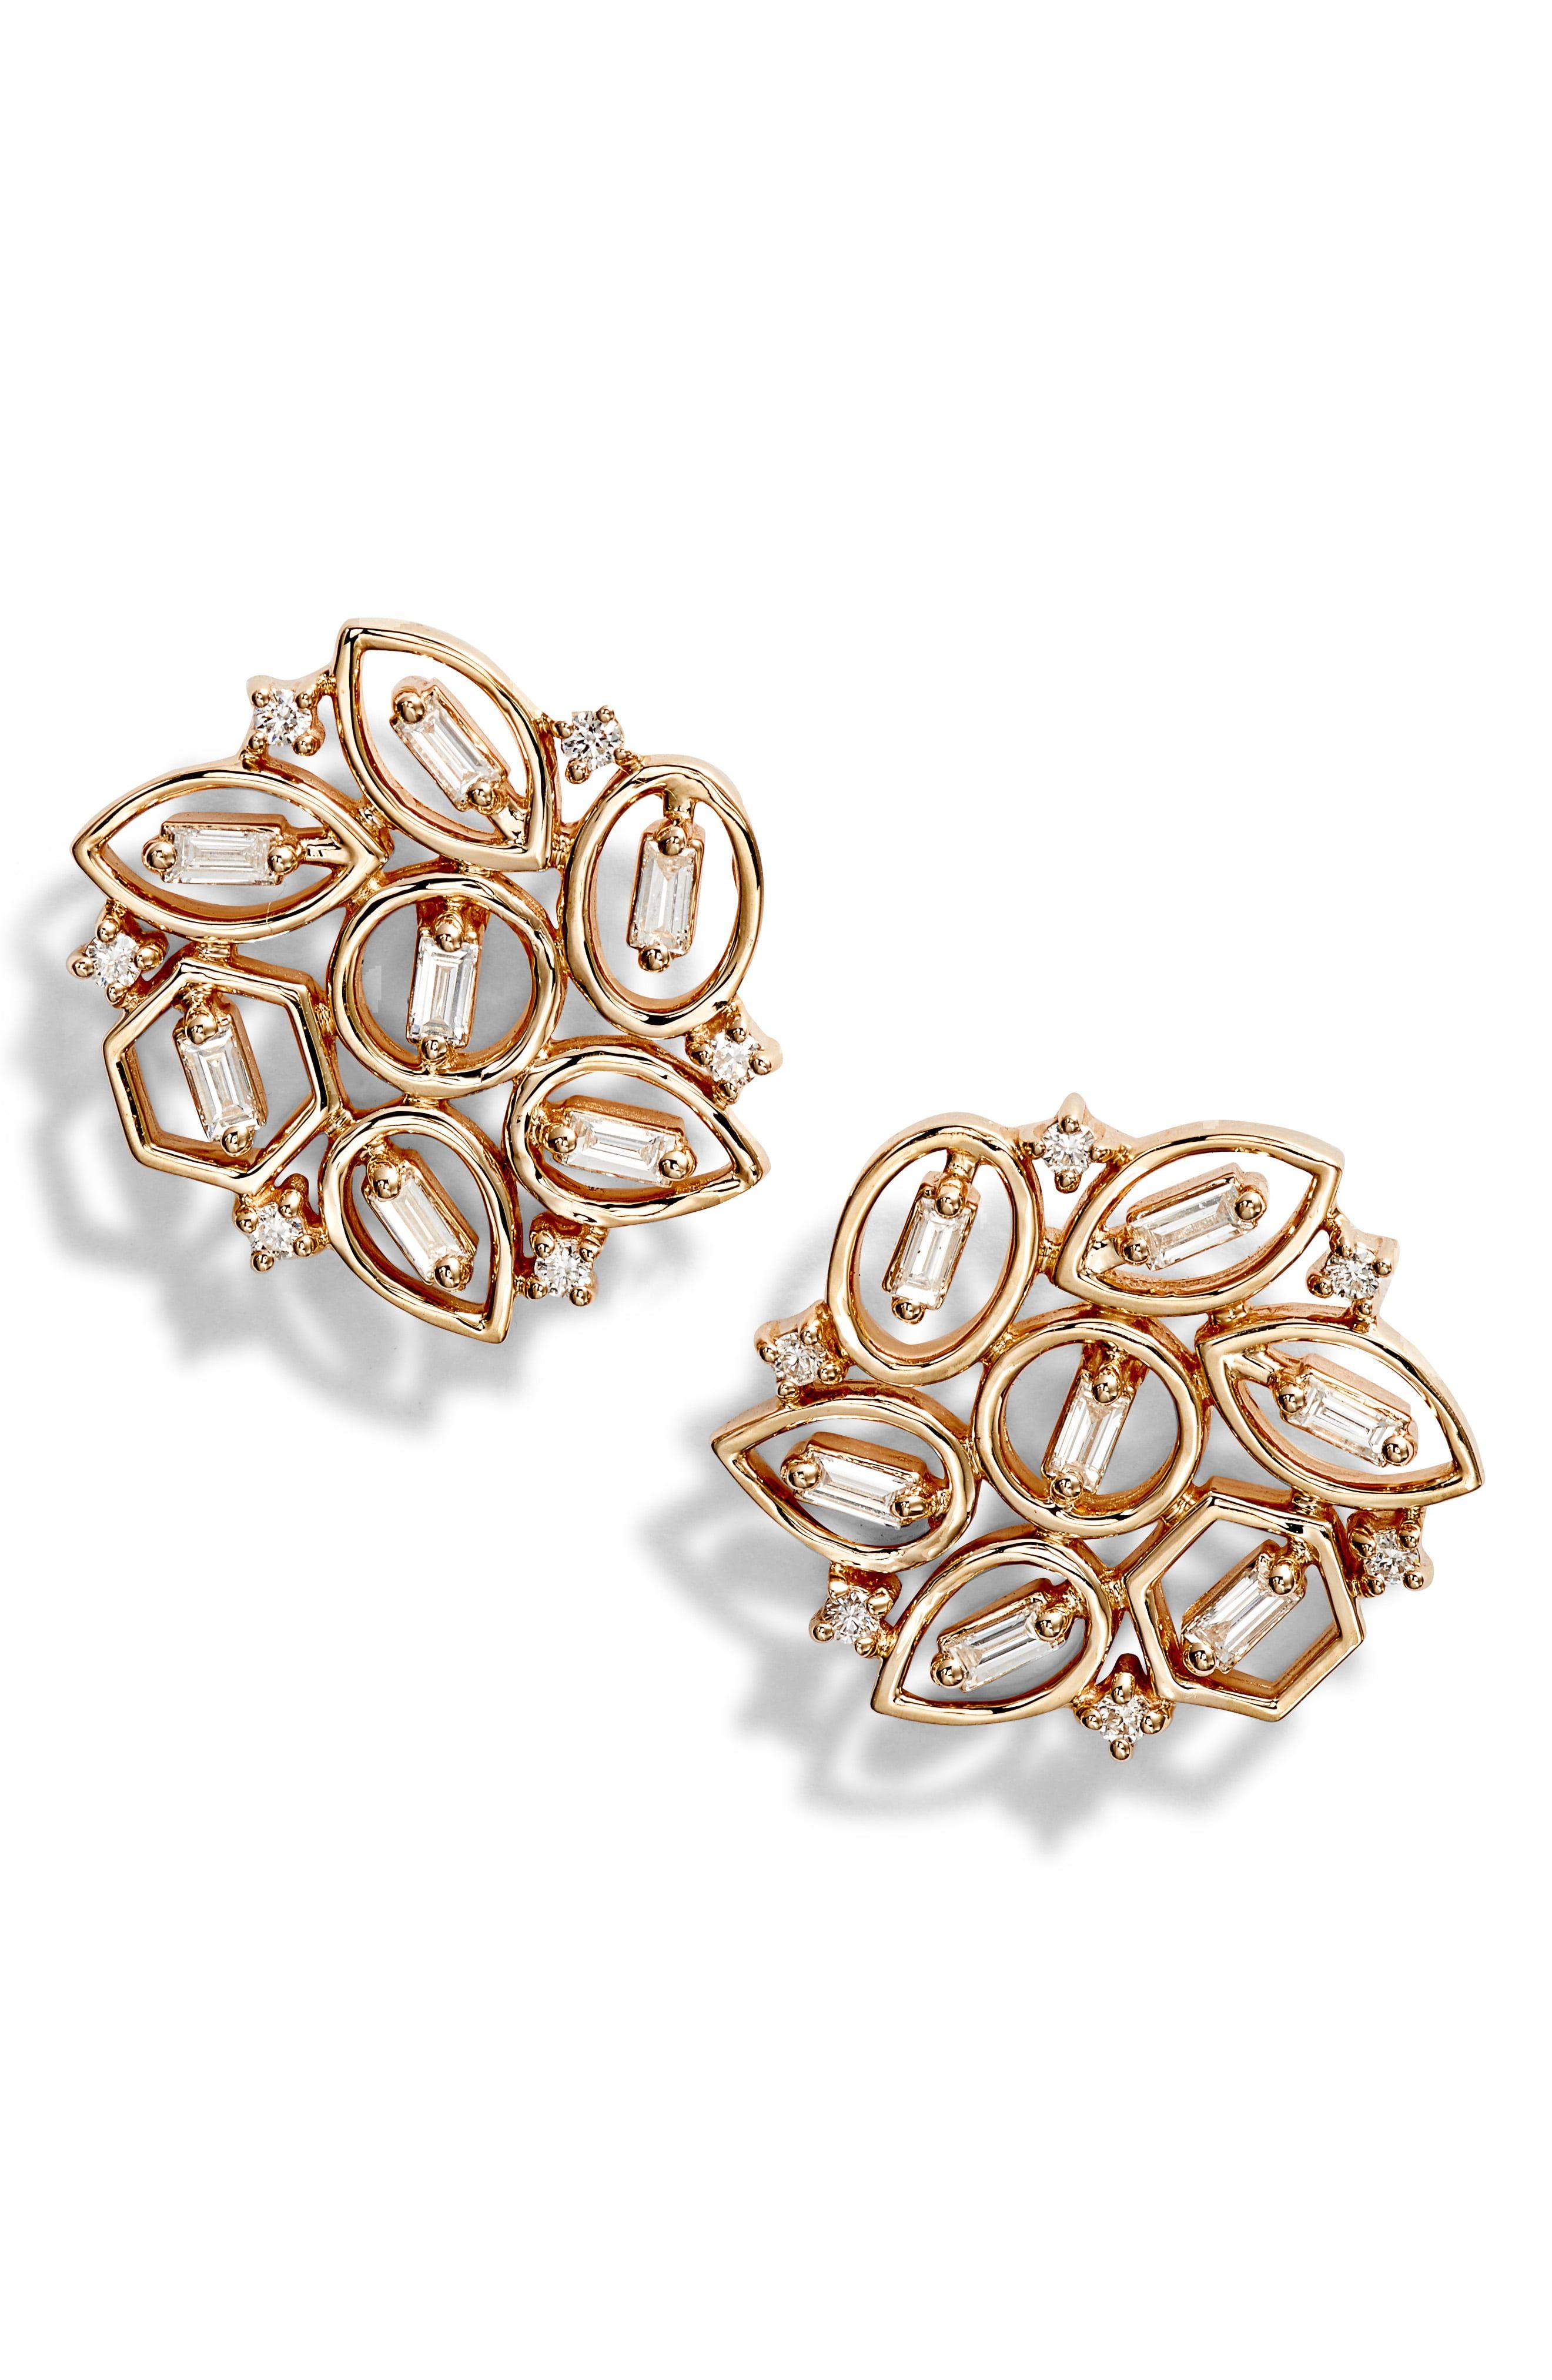 Women S Dana Rebecca Designs Brielle Rose Flower Diamond Stud Earrings Stud Earrings Diamond Studs Simple Earrings